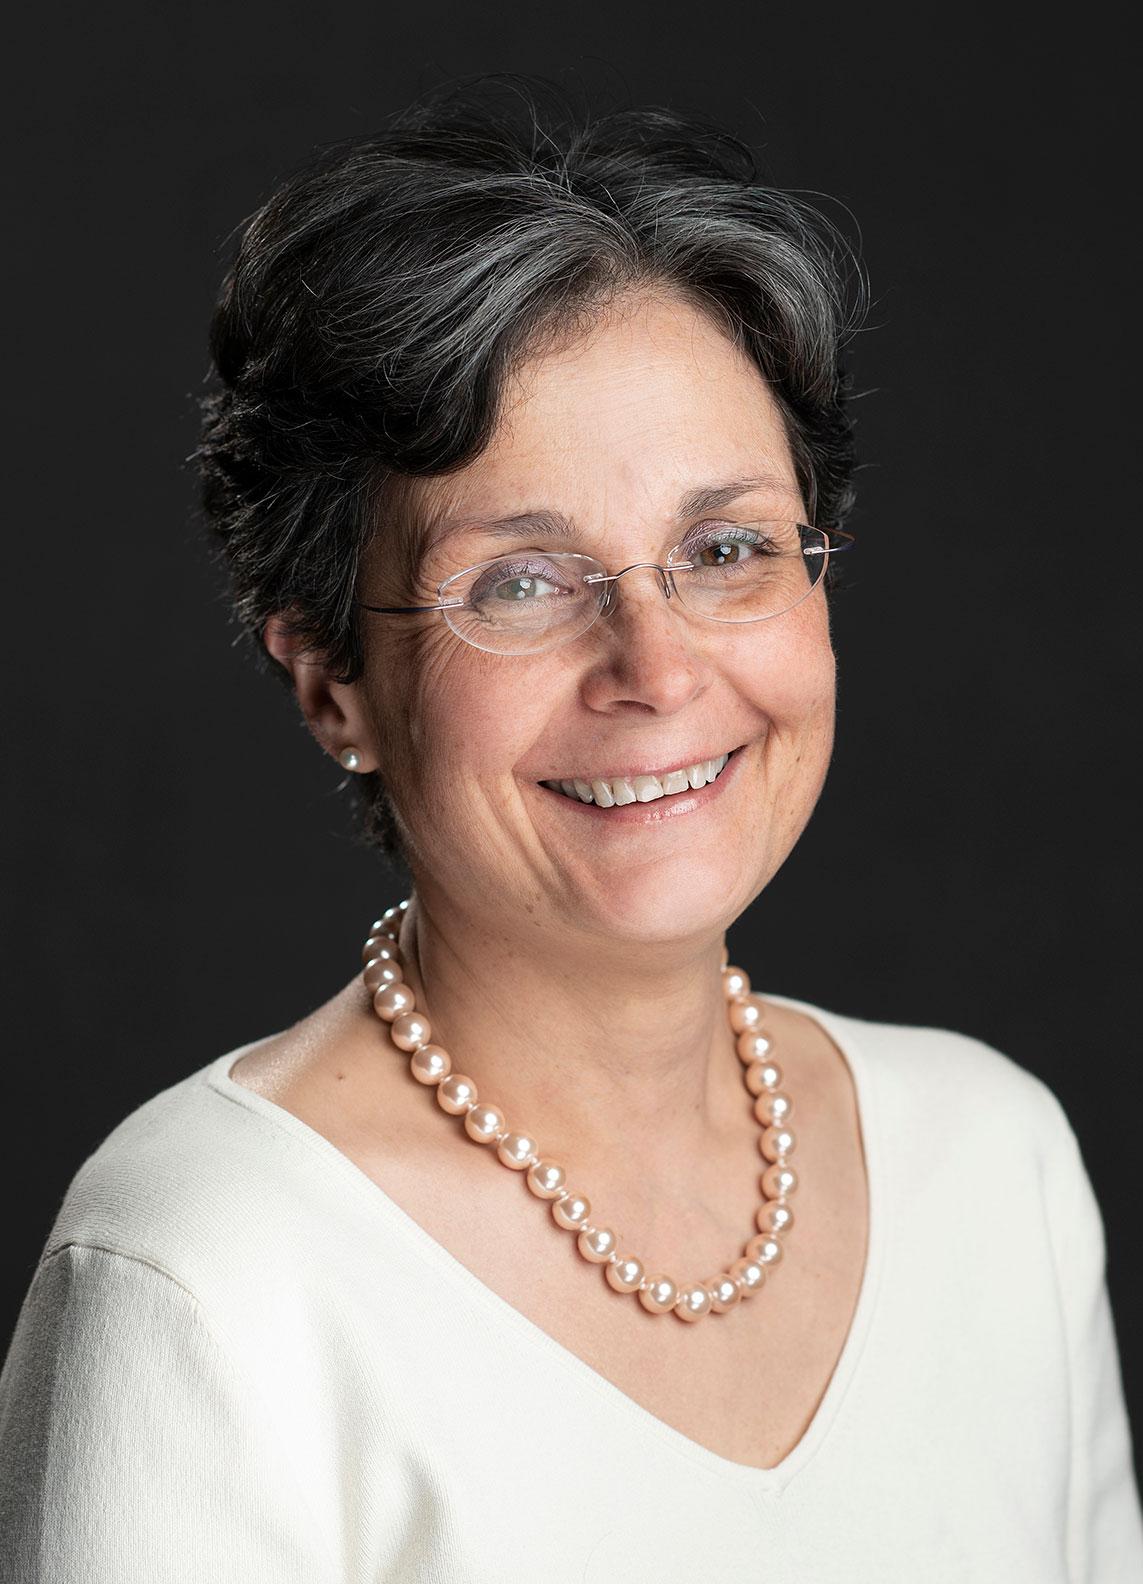 Professional headhshot of woman wearing glasses